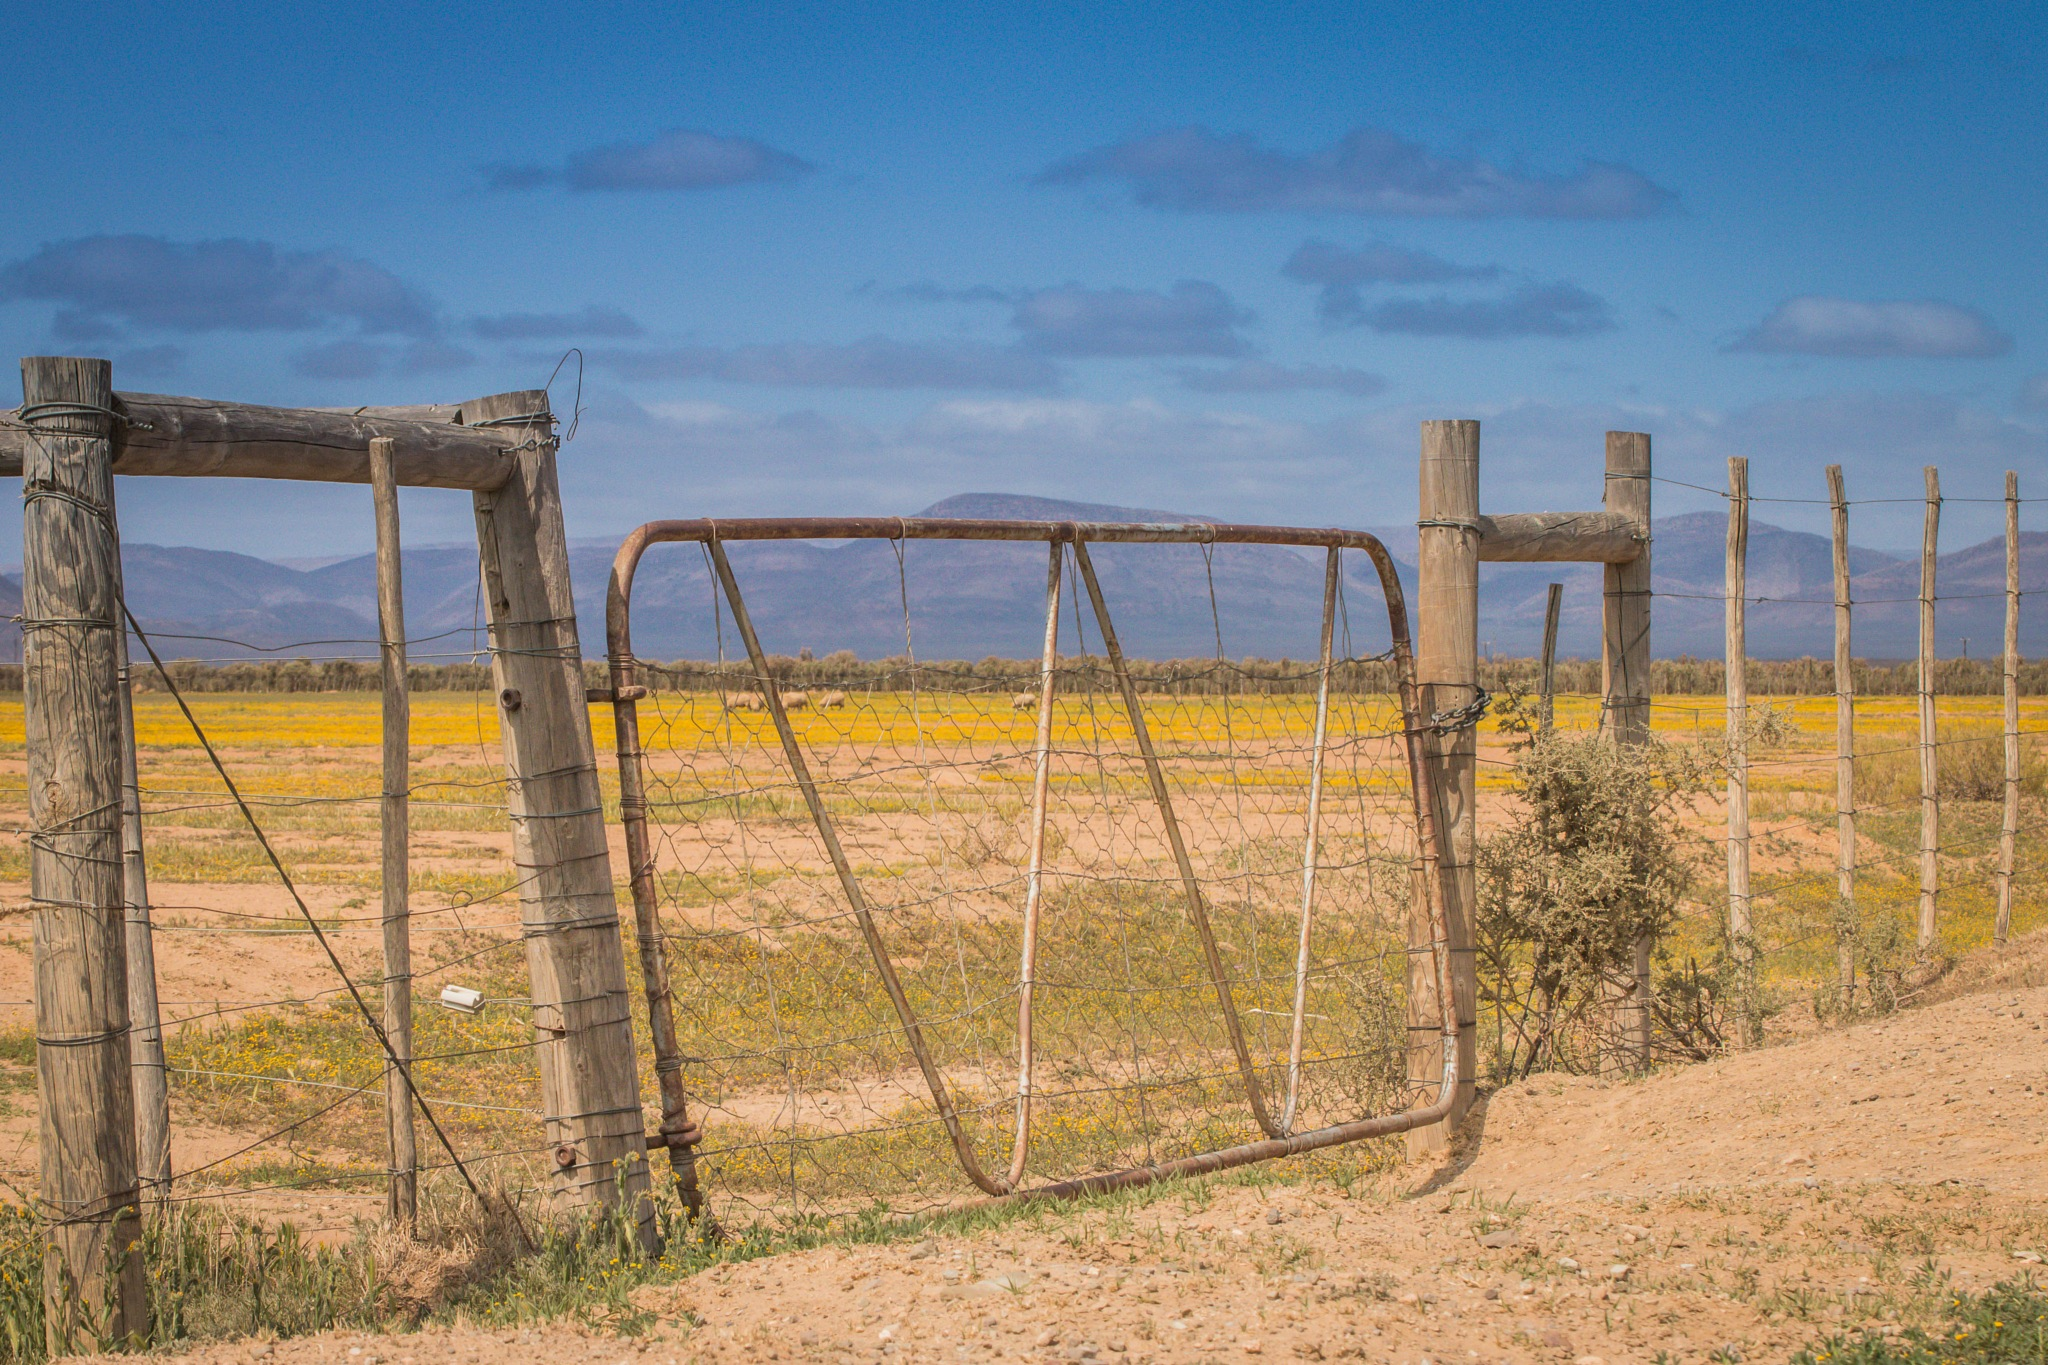 The Gate by Lanie Badenhorst